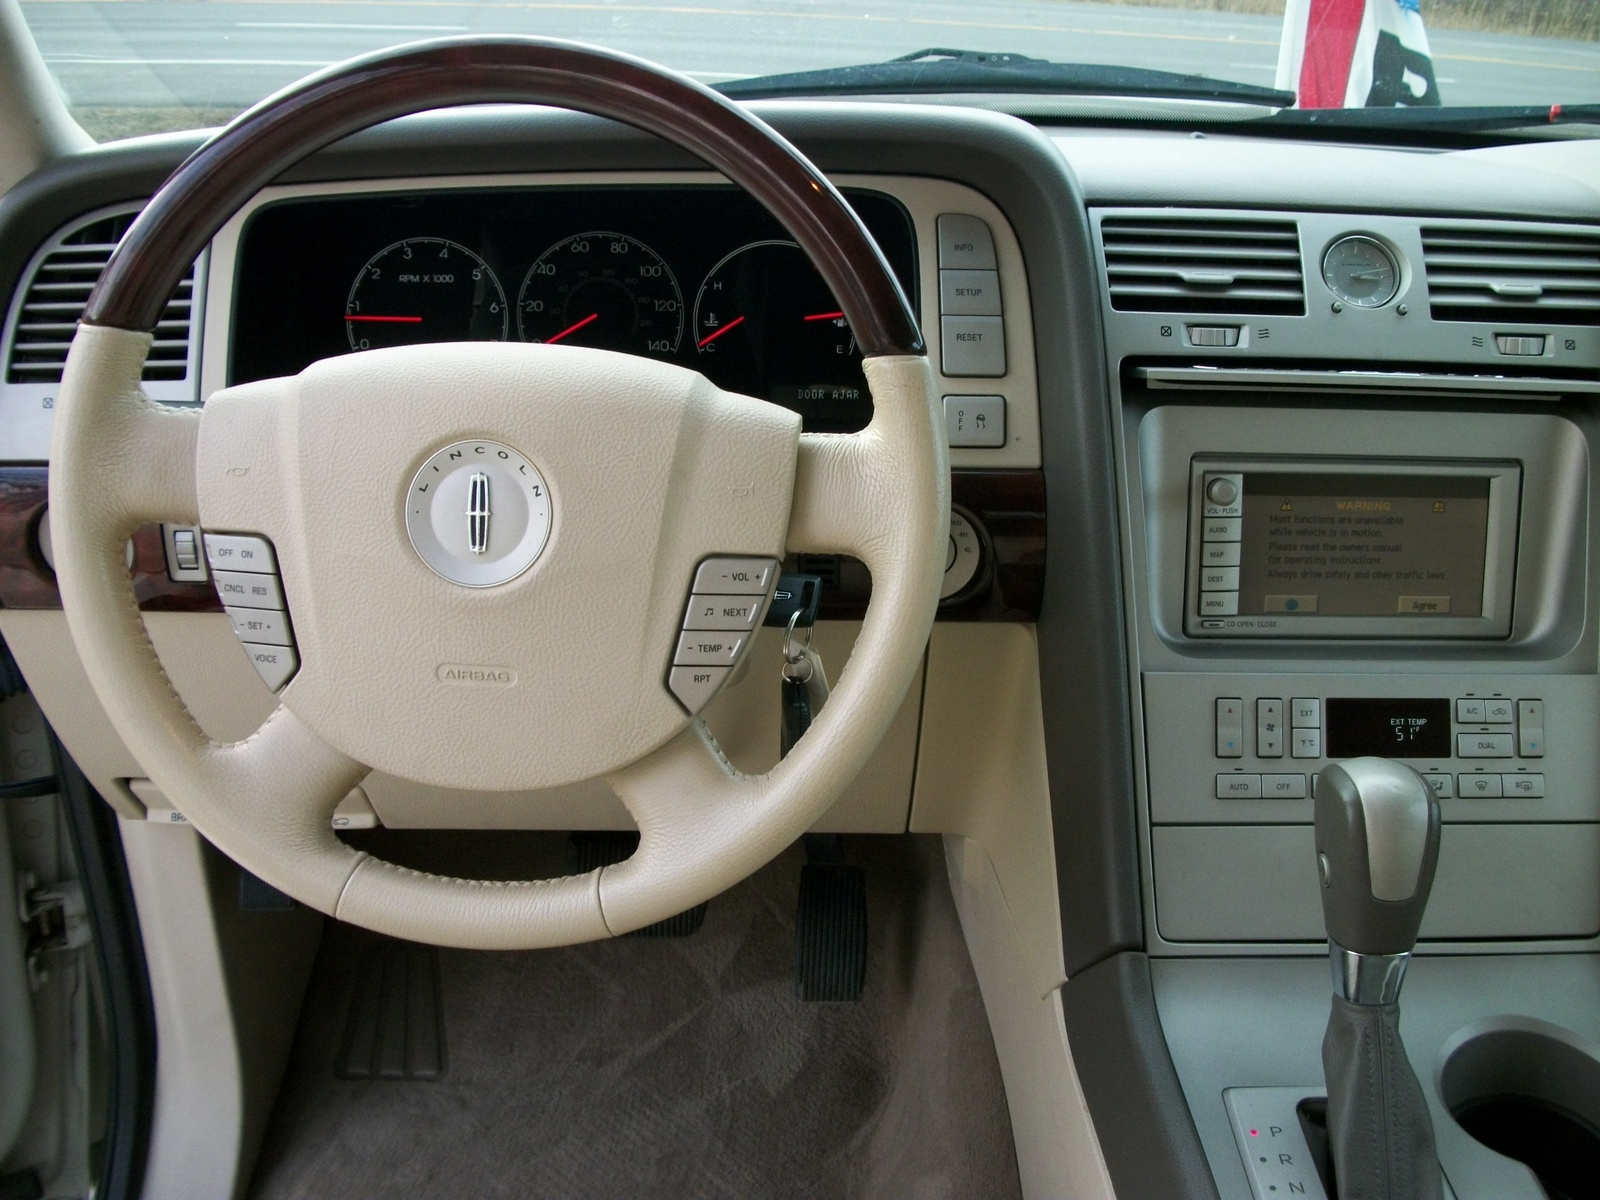 2004 Lincoln Navigator Pictures Cargurus